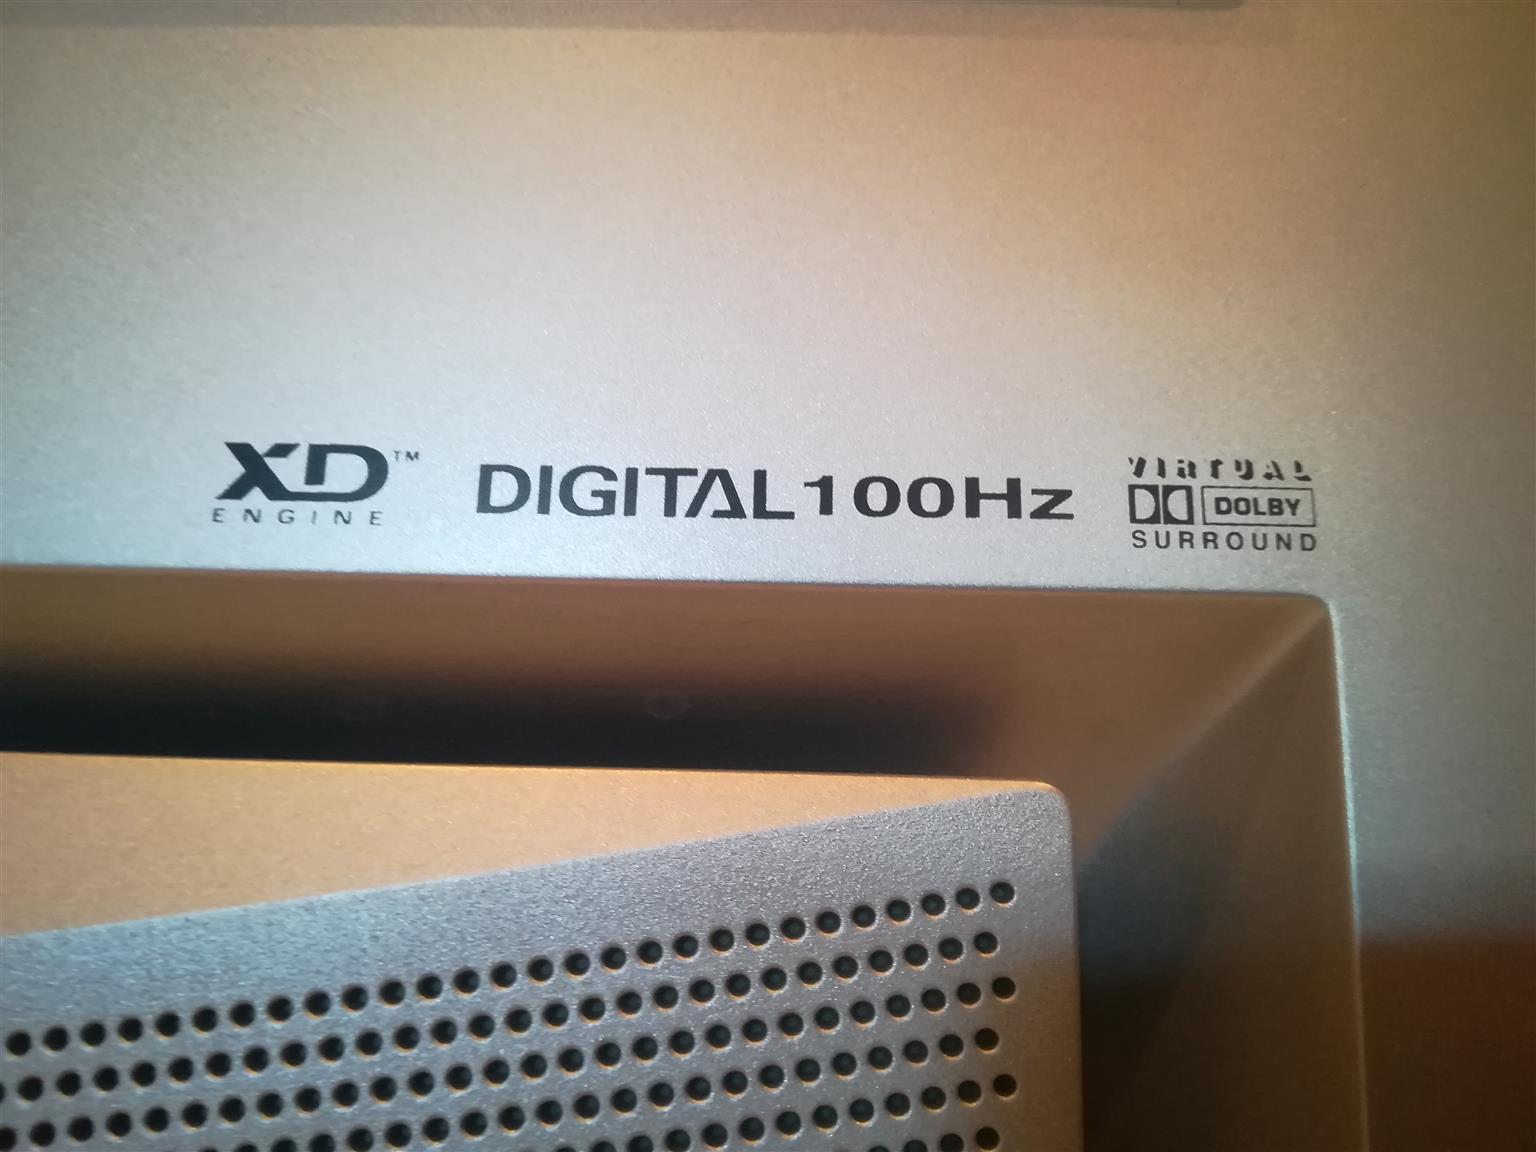 Large LG XD Engine Digital 100Hz